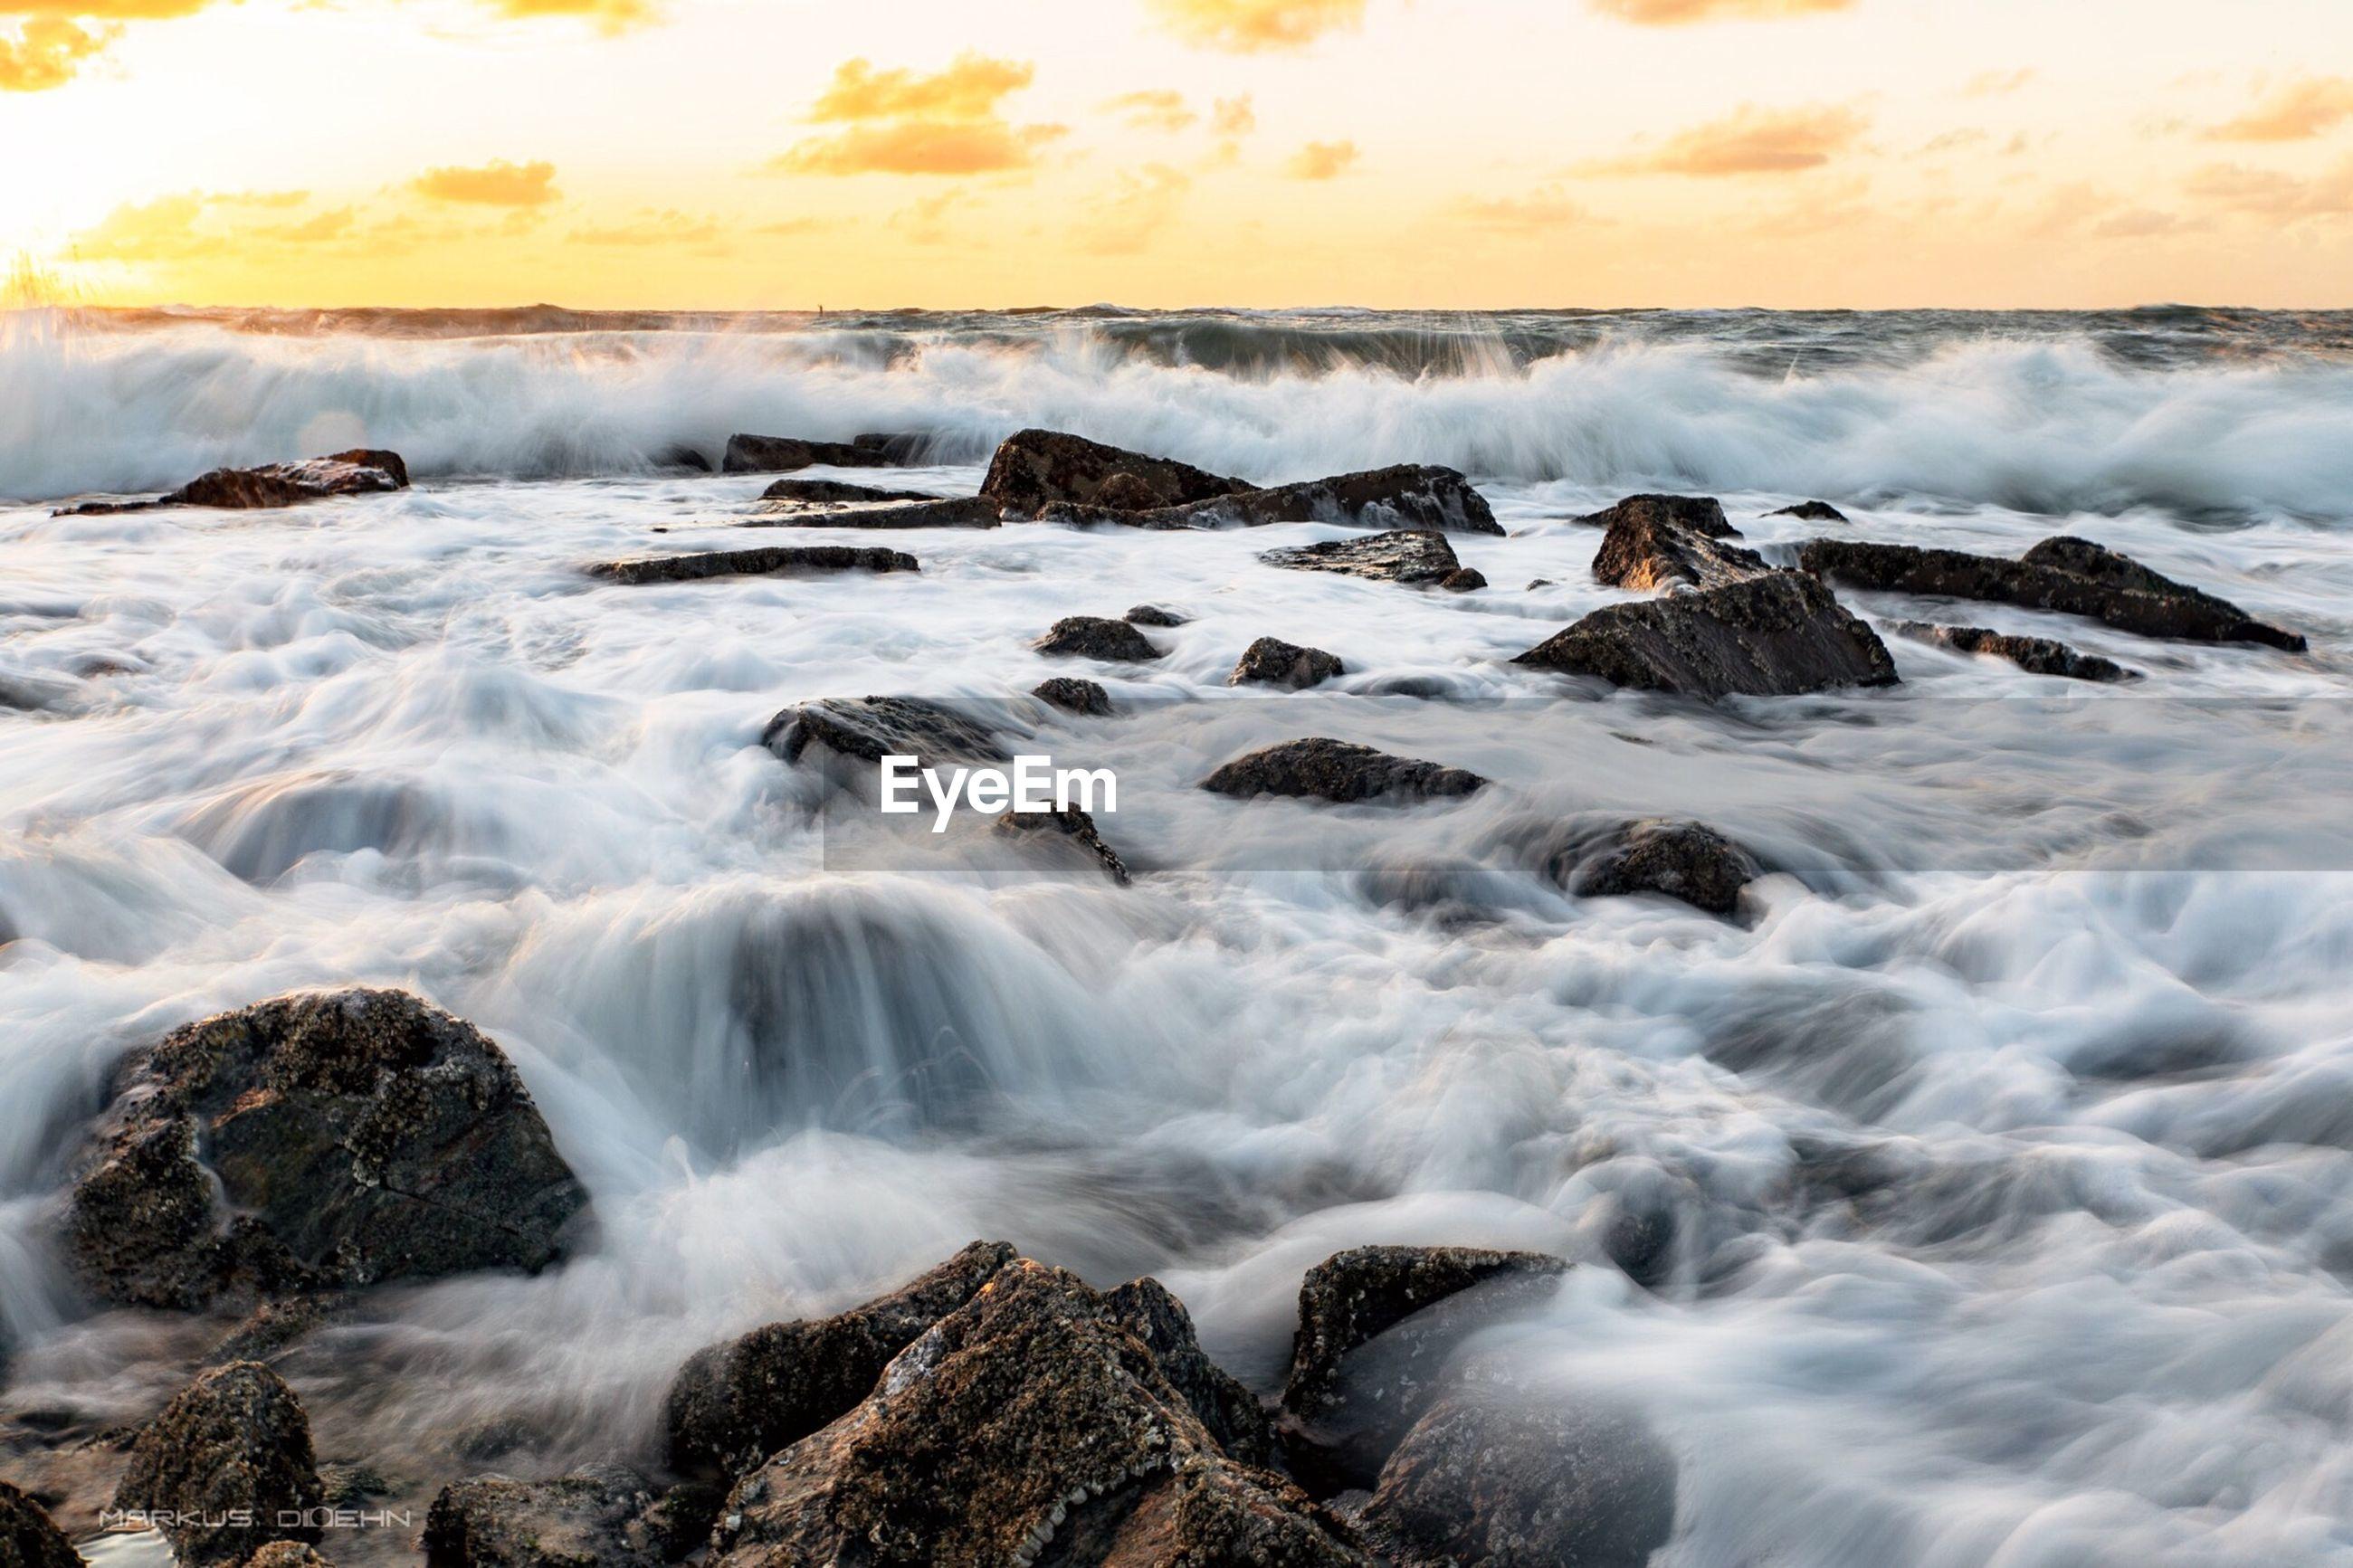 Blurred motion of waves splashing on rocks at shore